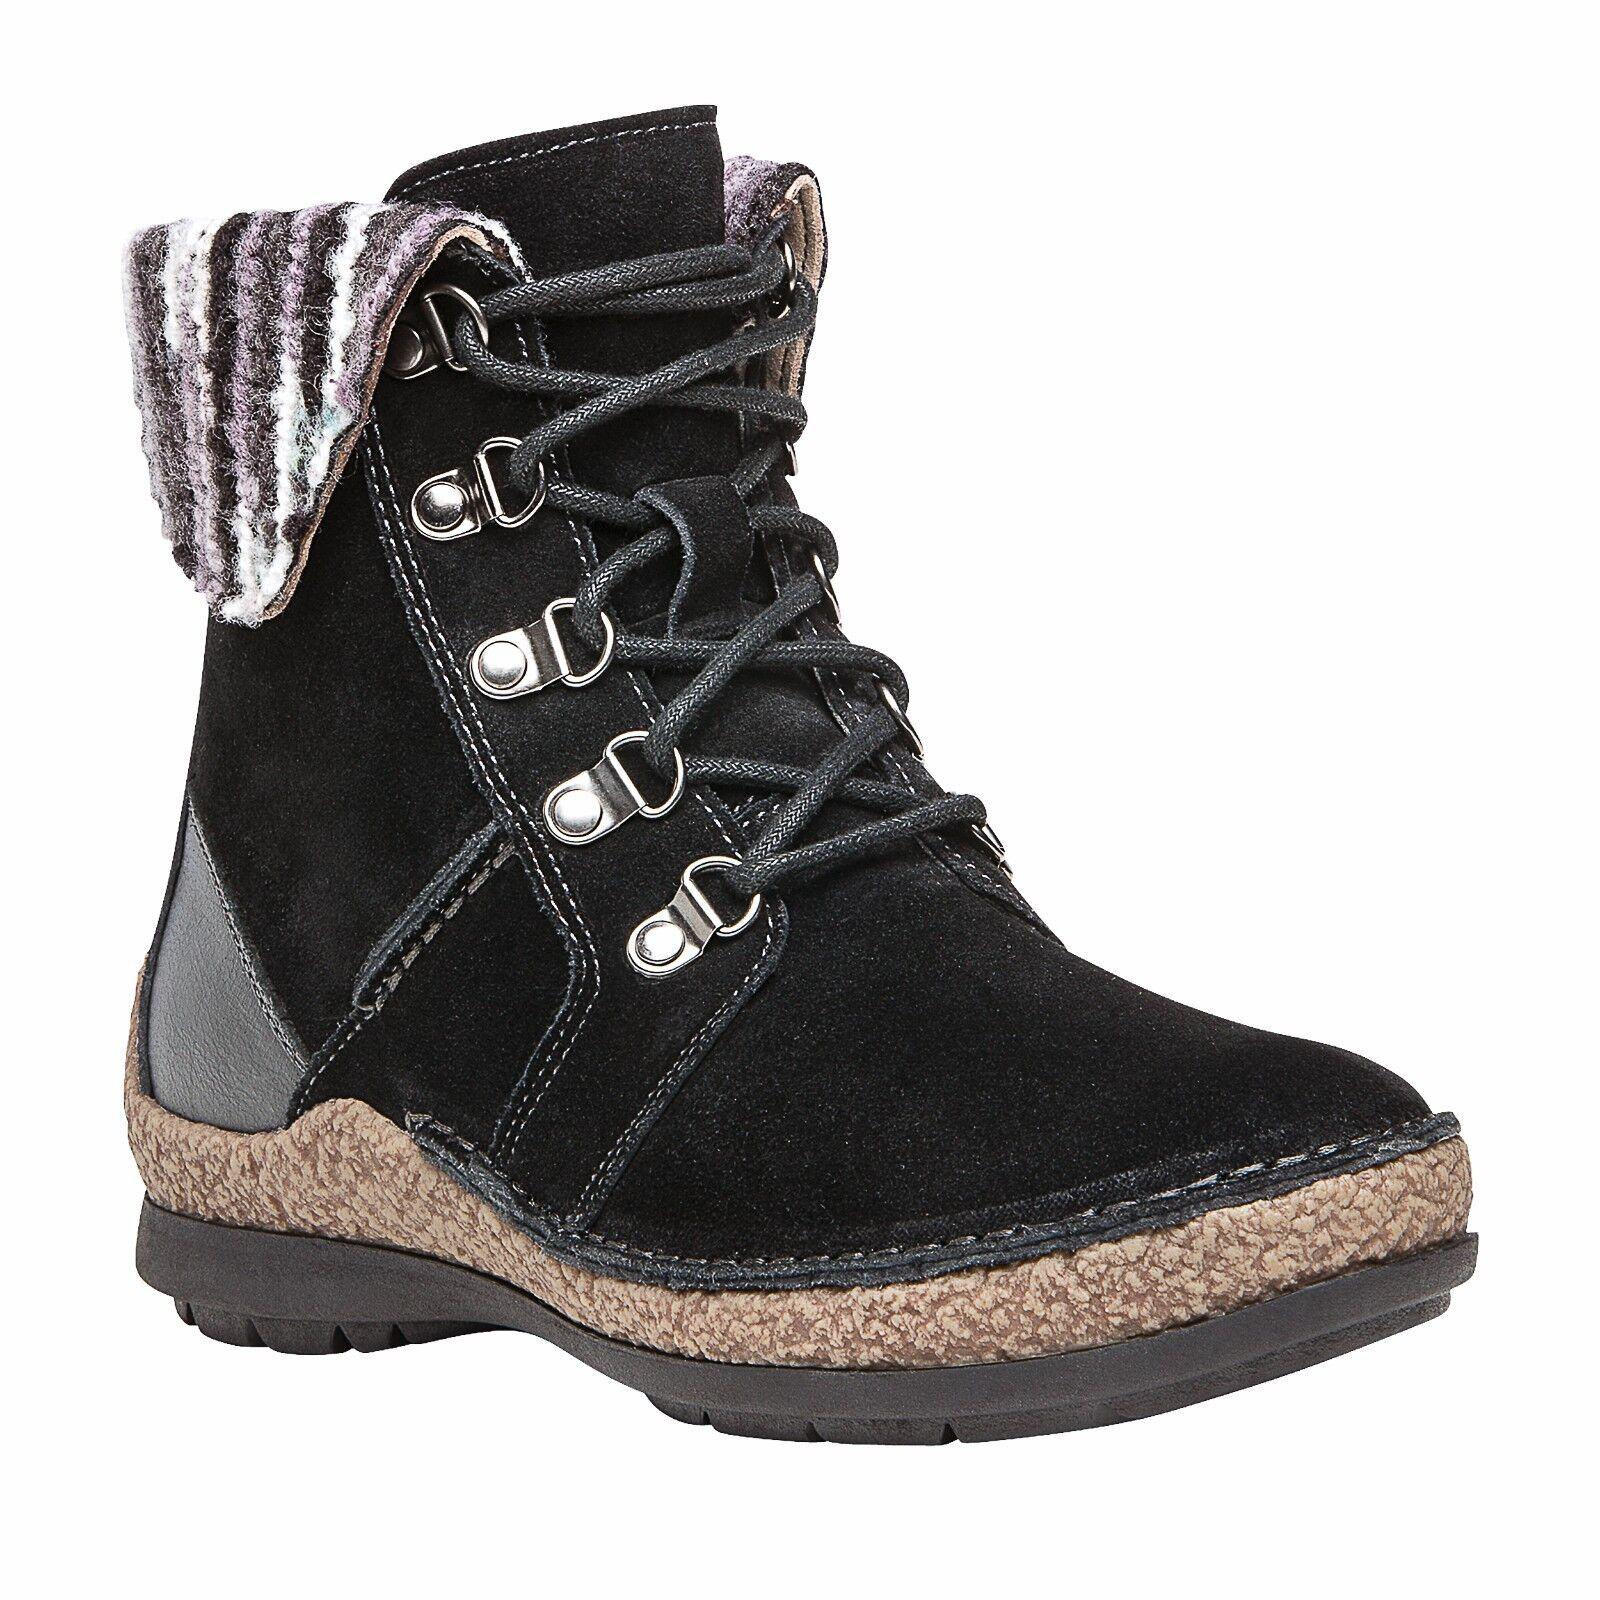 Propet Damens Dayna Dayna Damens Ankle Stiefel WFV012S f55e04